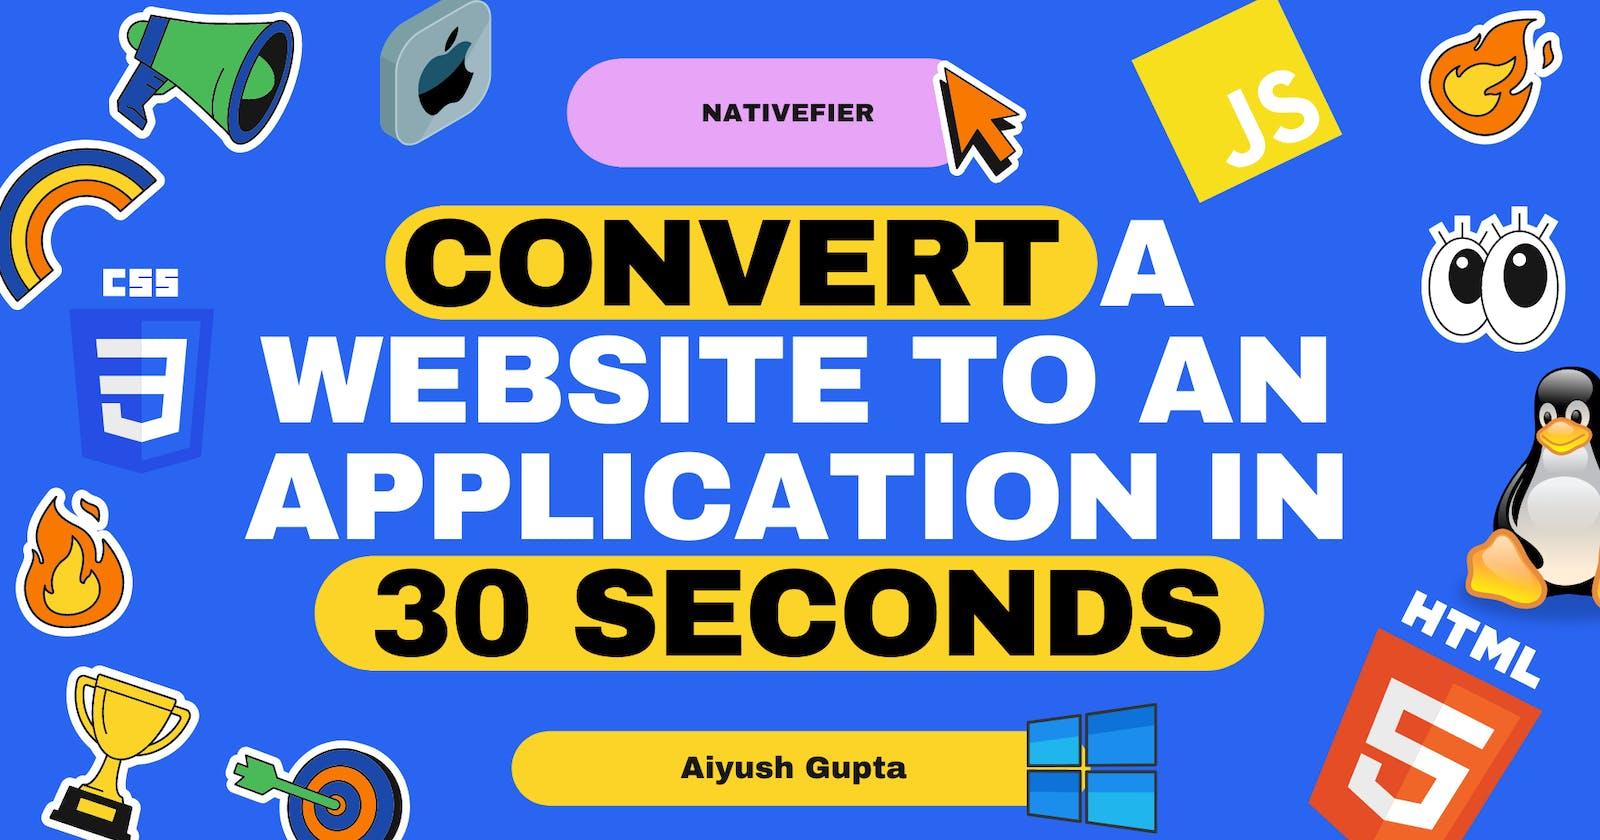 Convert Your Website into a Desktop Application in 30 seconds!